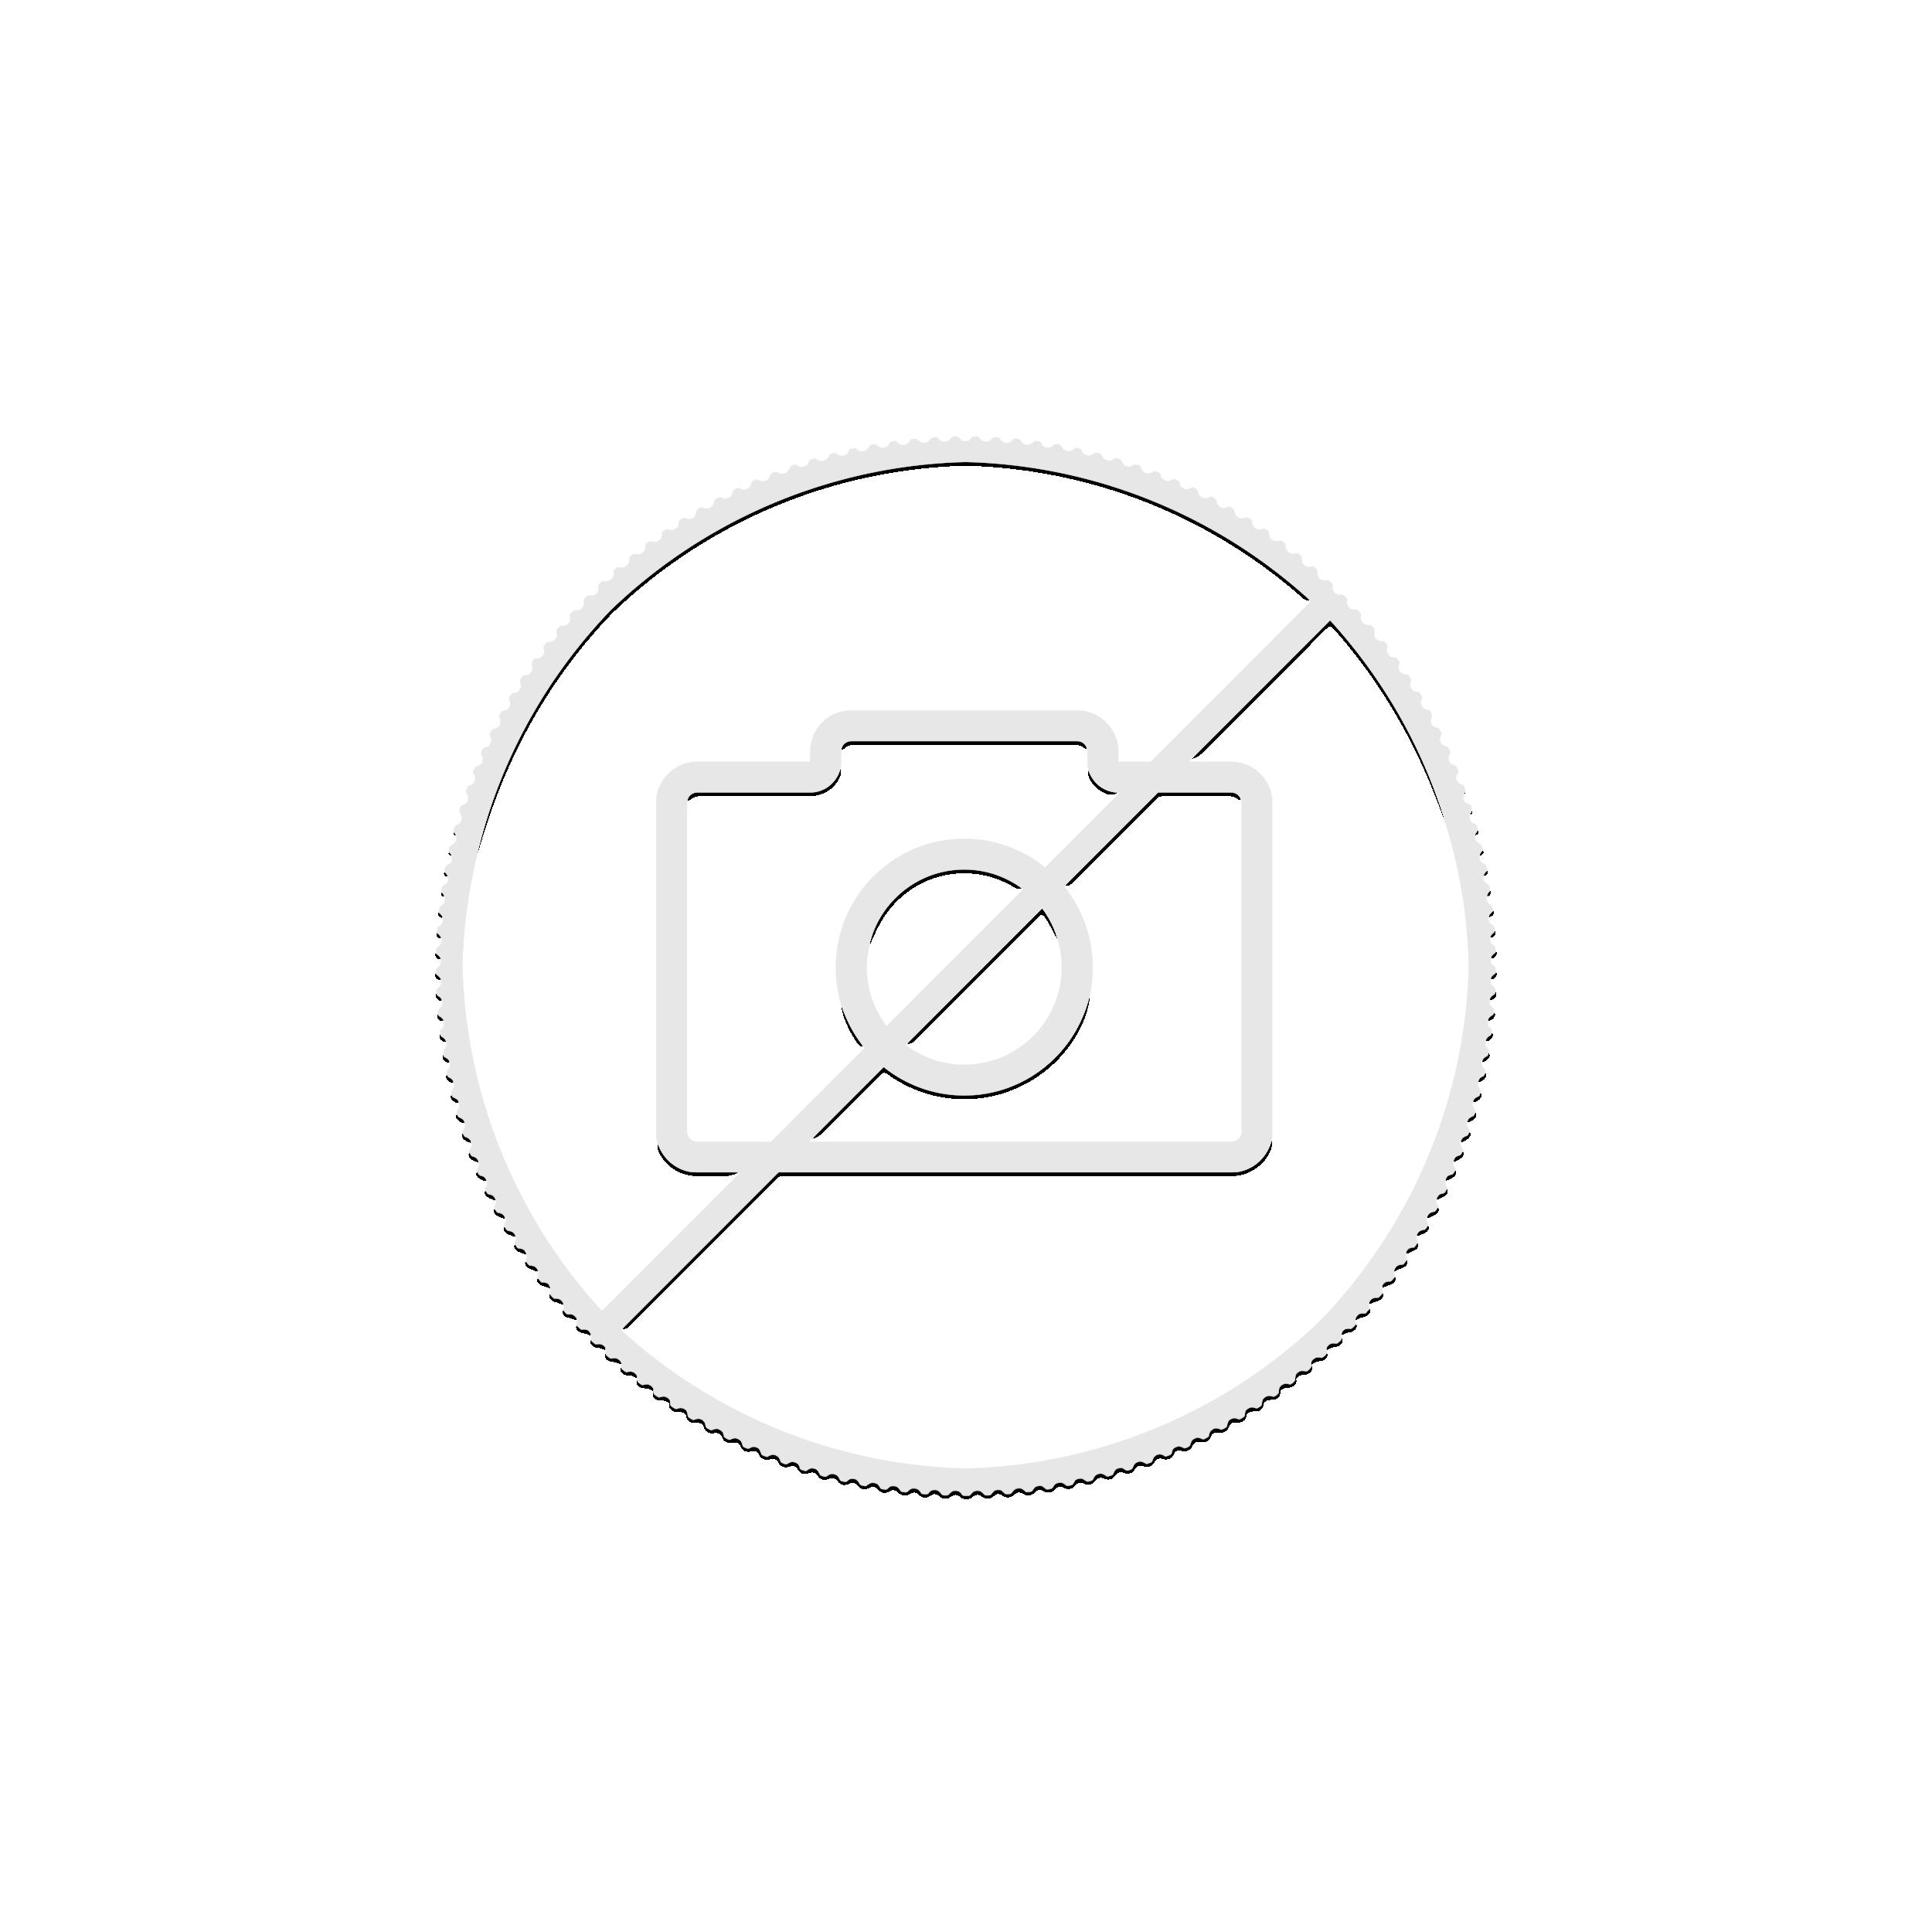 25 Troy ounce diverse zilveren verzamelmunten - 1/2 oz